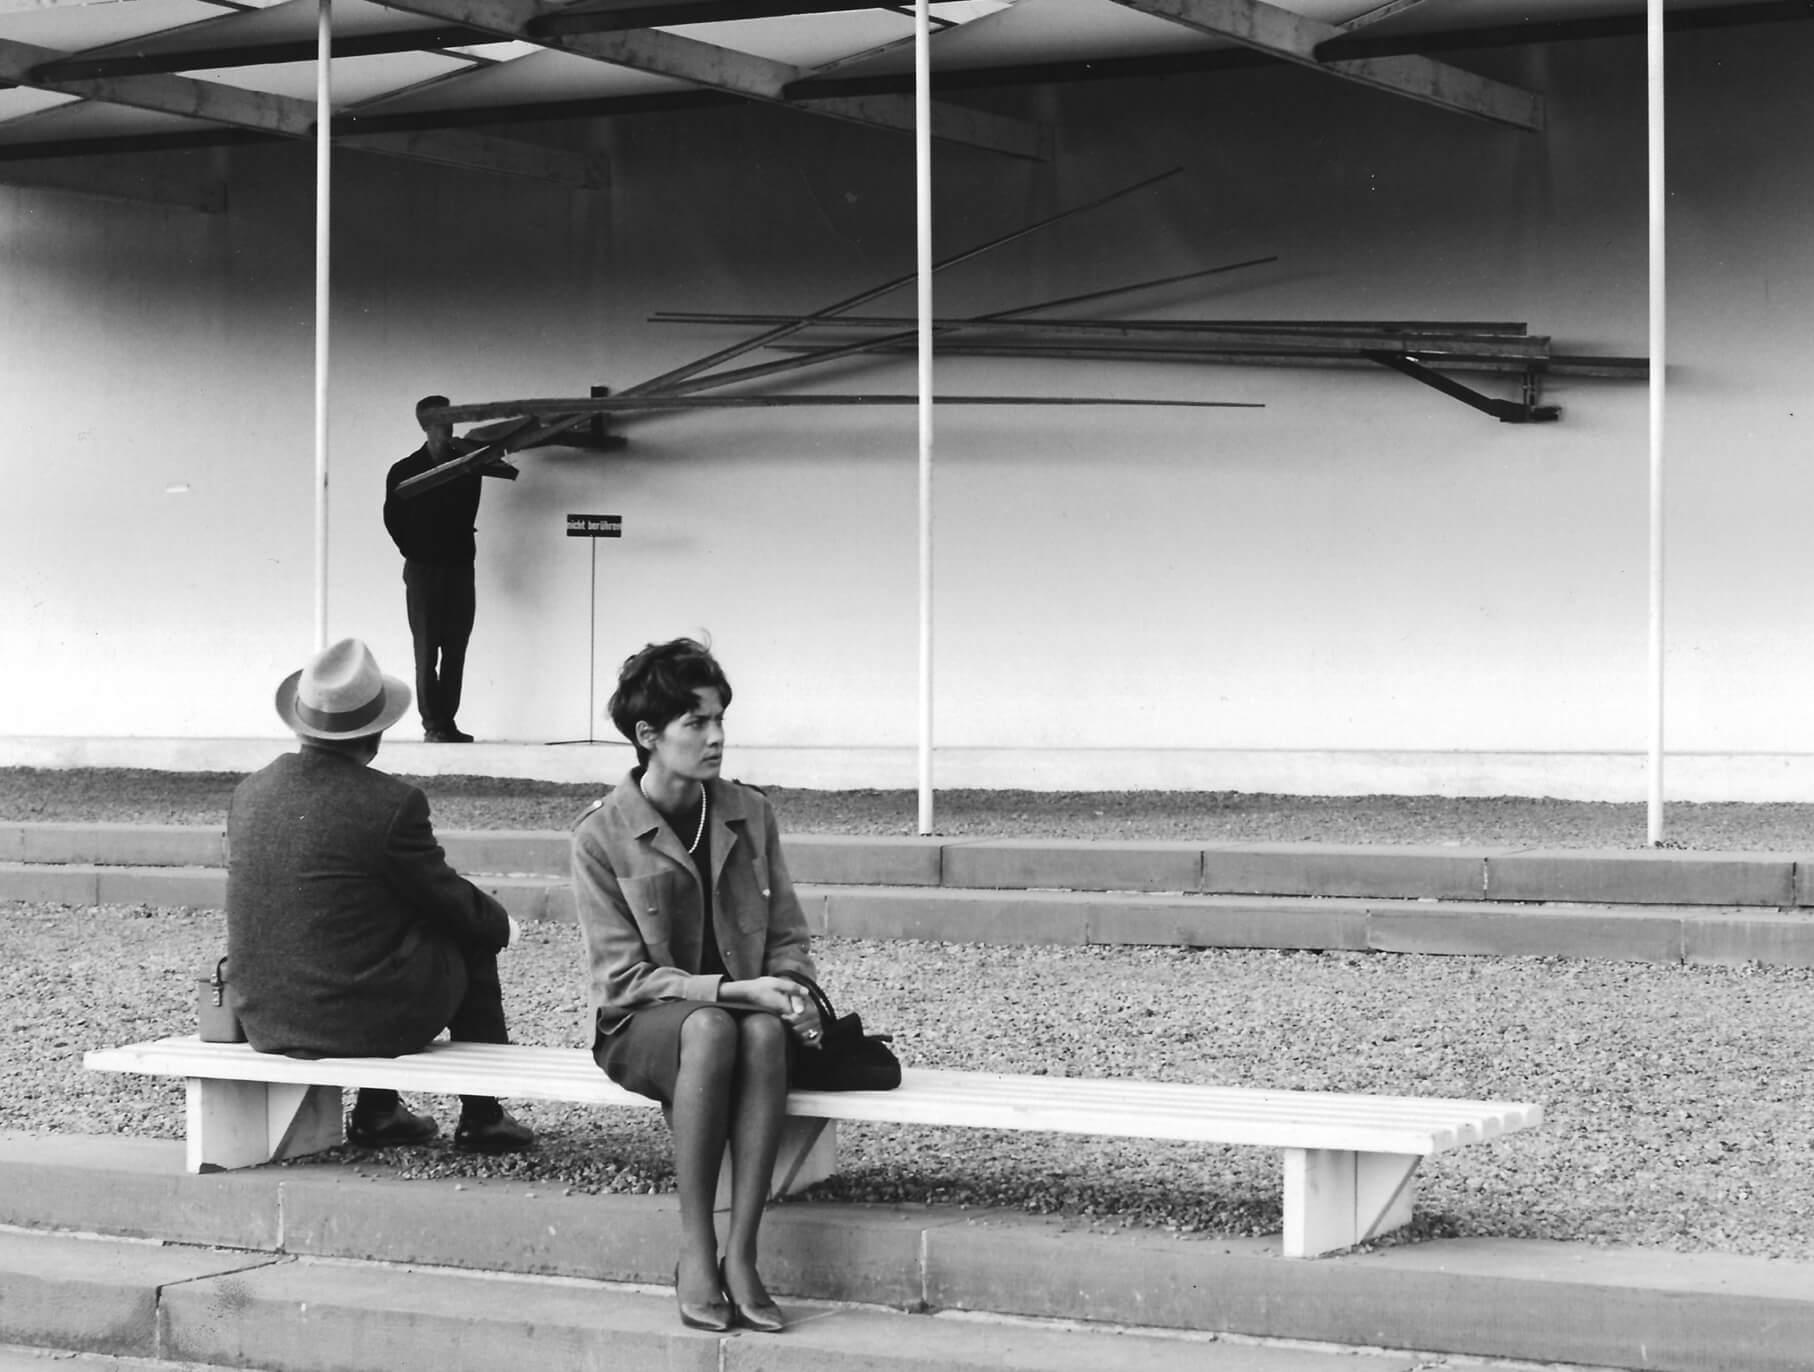 Landscape III Variation II (1964) at Documenta III, Jun 27–Oct 5, 1964, Kassel,Germany